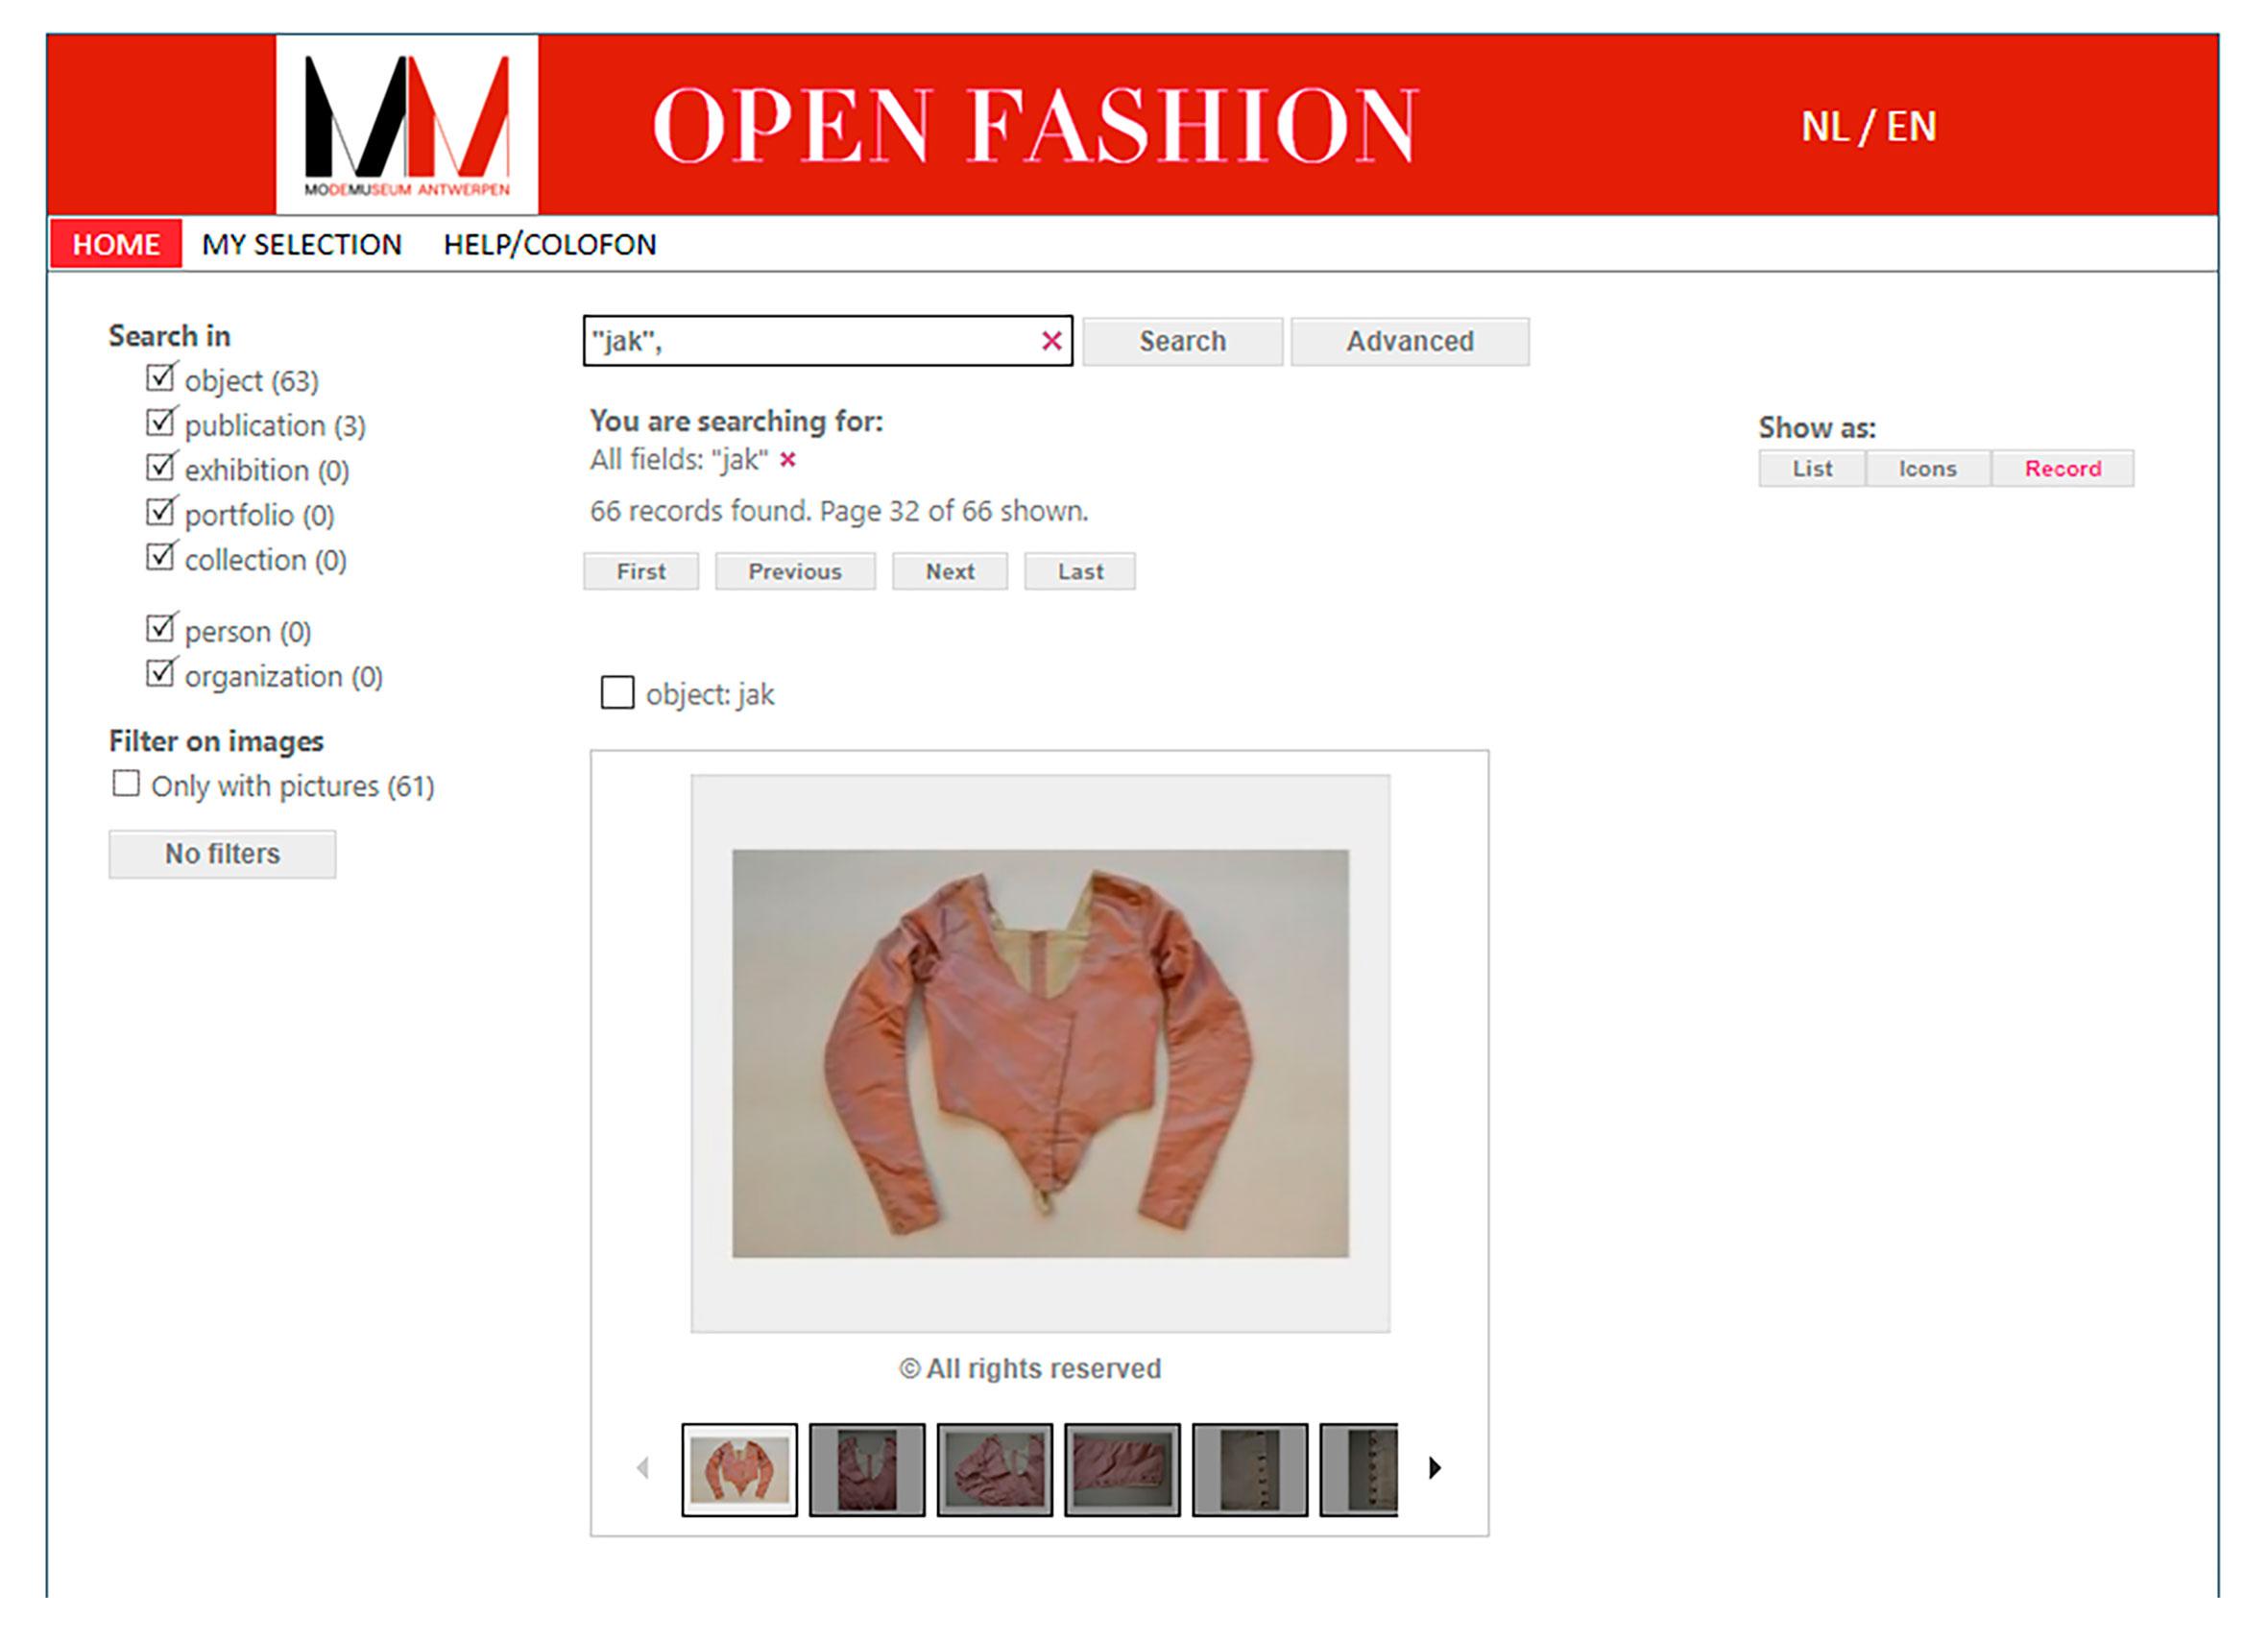 Fondos de indumentaria _ MOMU_Museo de moda de Bélgica